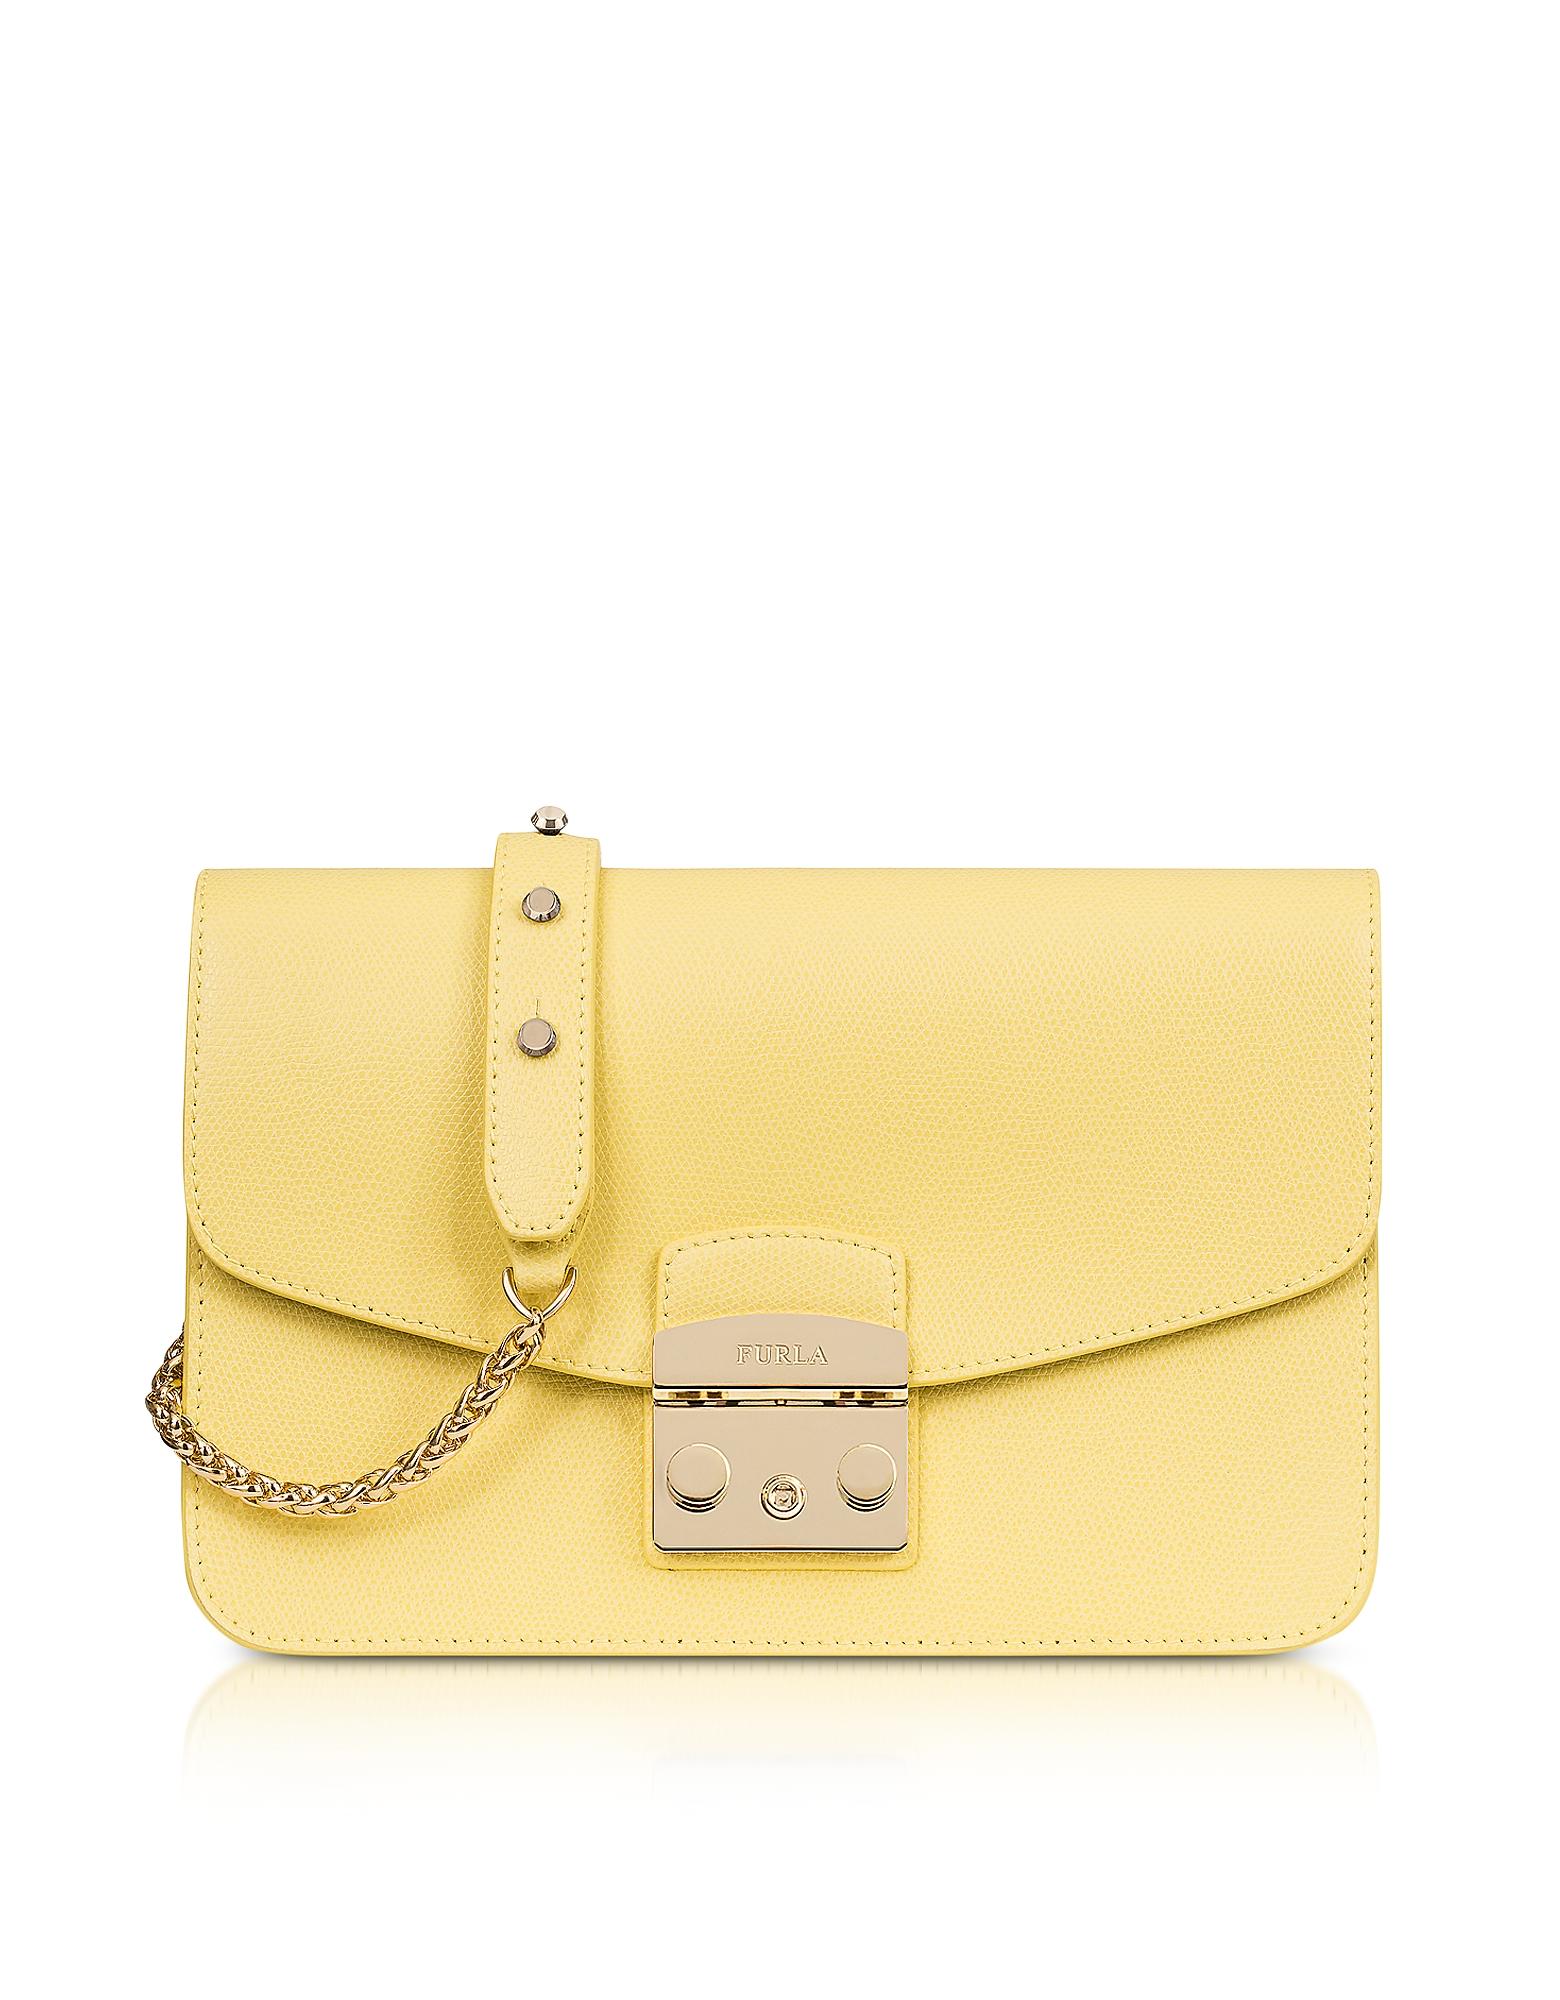 Furla Handbags, Cedar Leather Metropolis Small Shoulder Bag